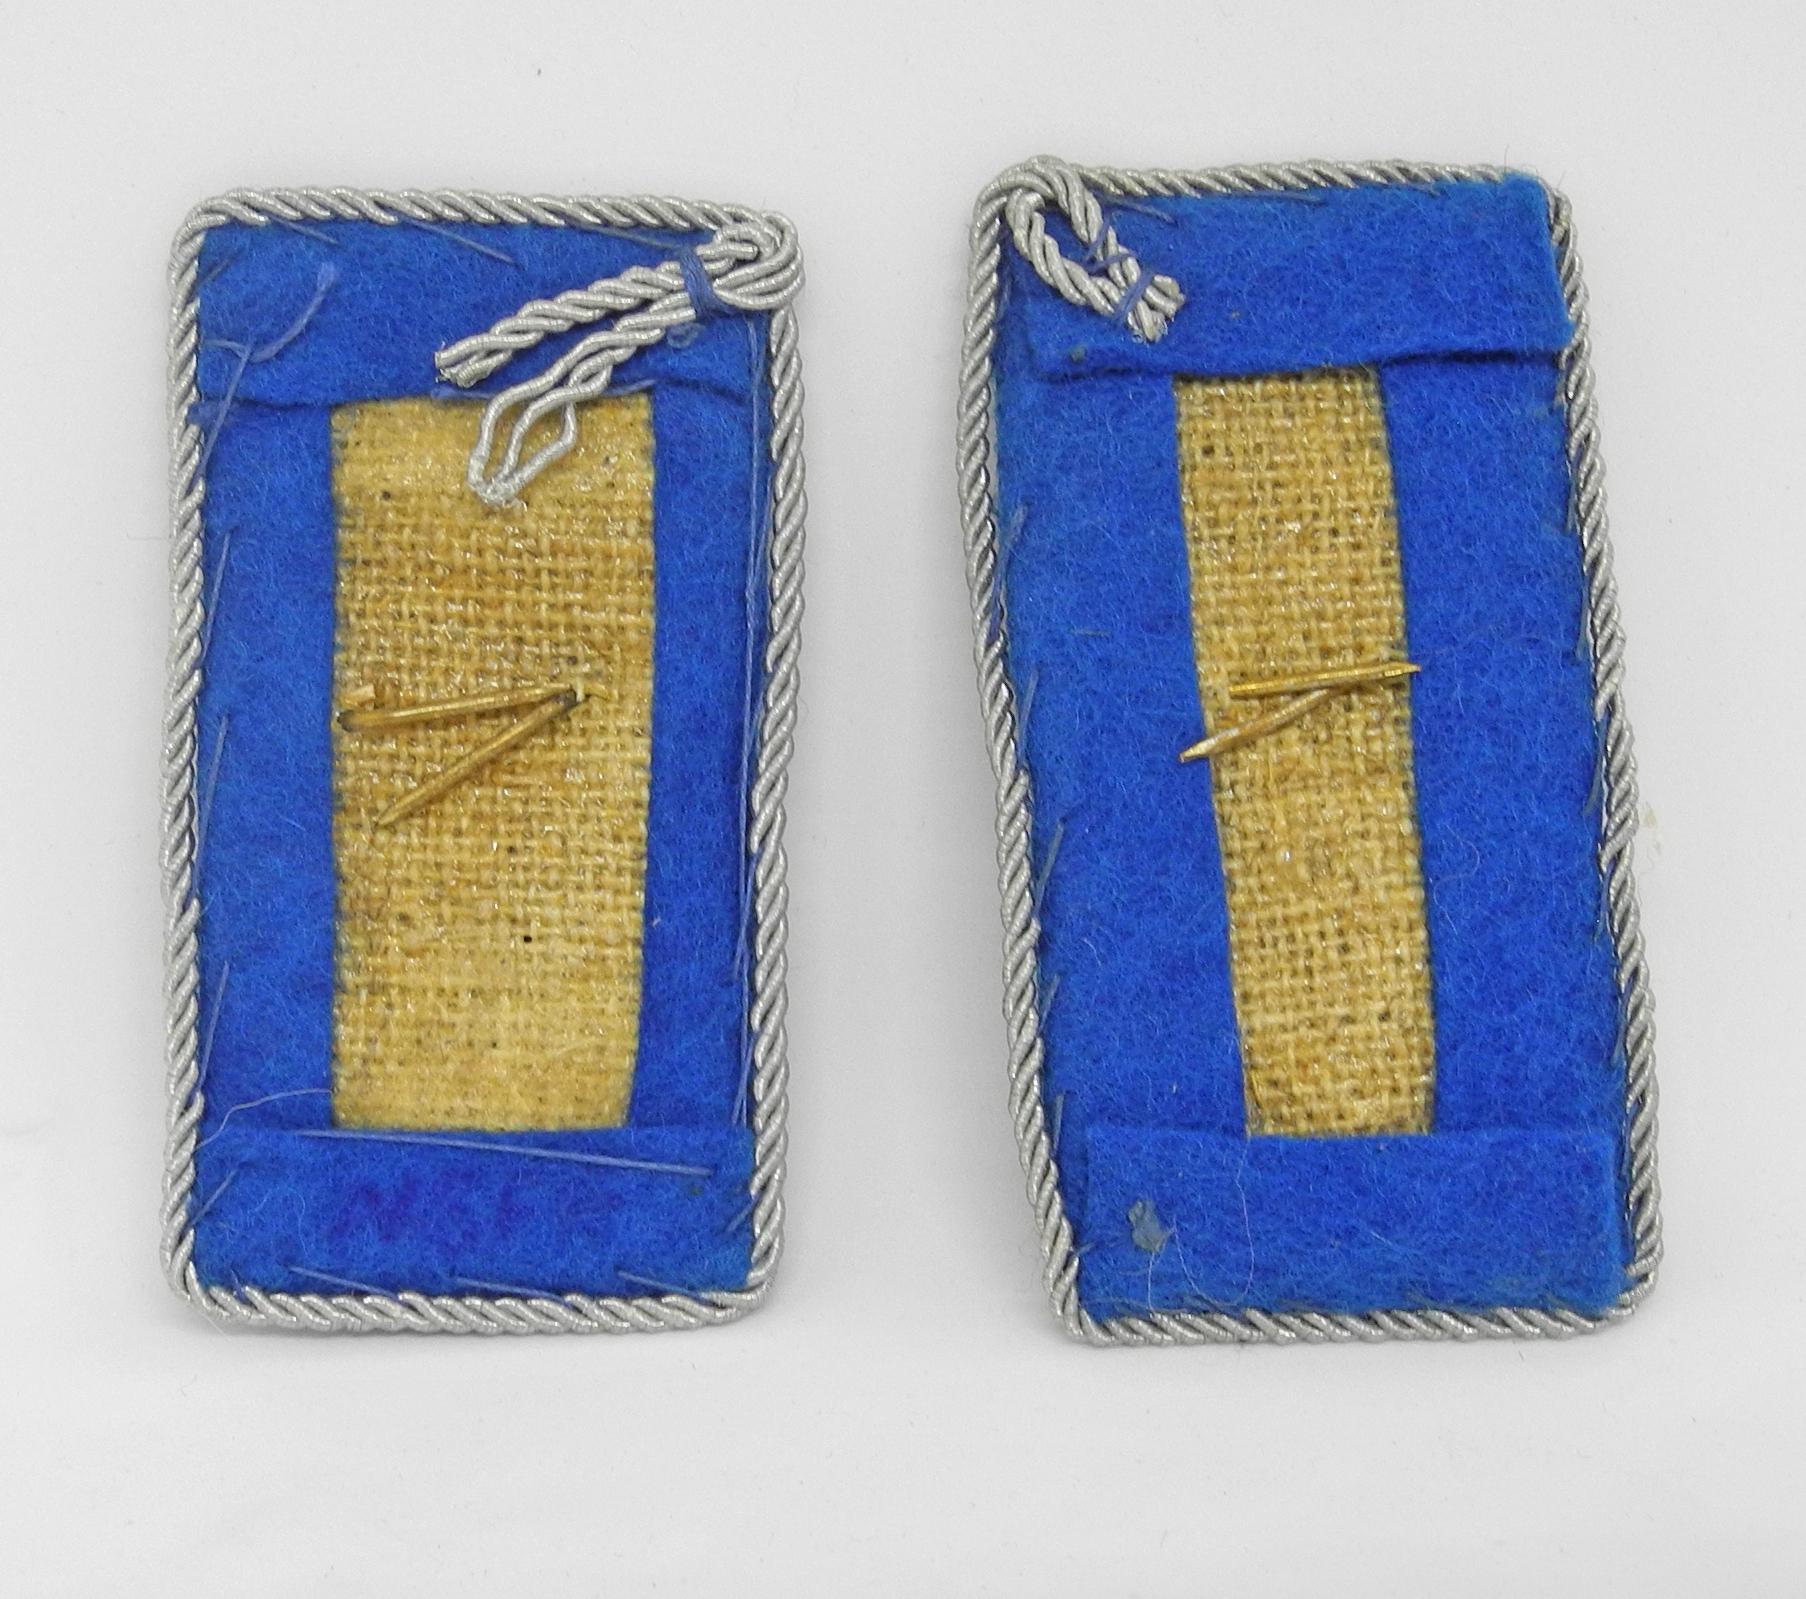 LW officer's collar tabs